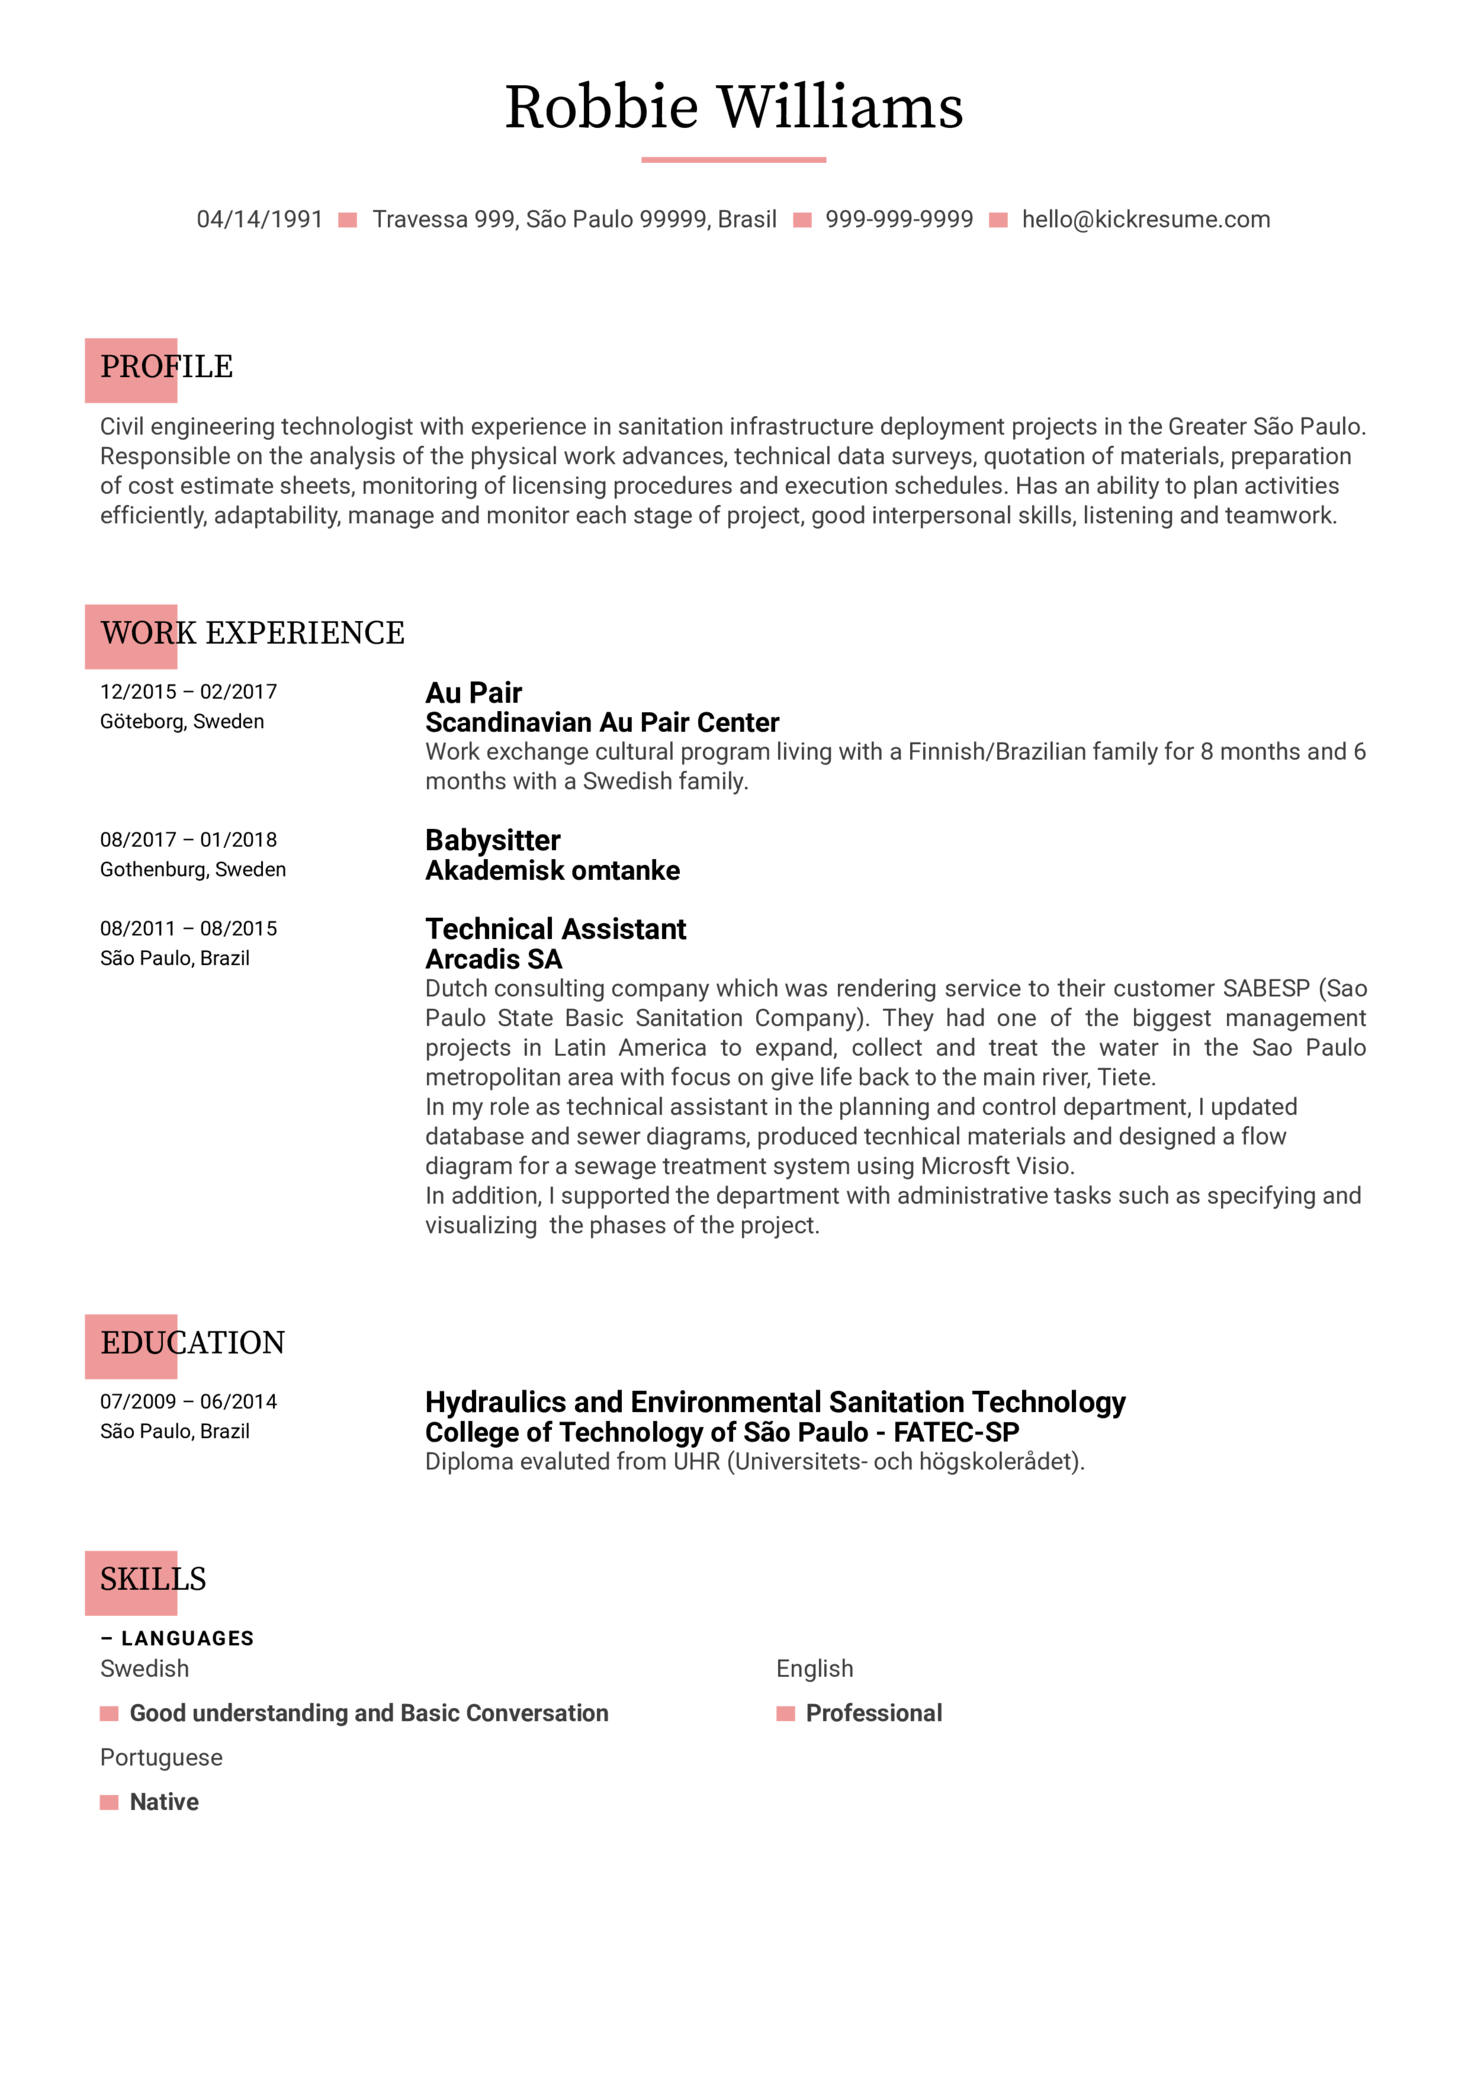 Engineering Technologist CV Template (Part 1)